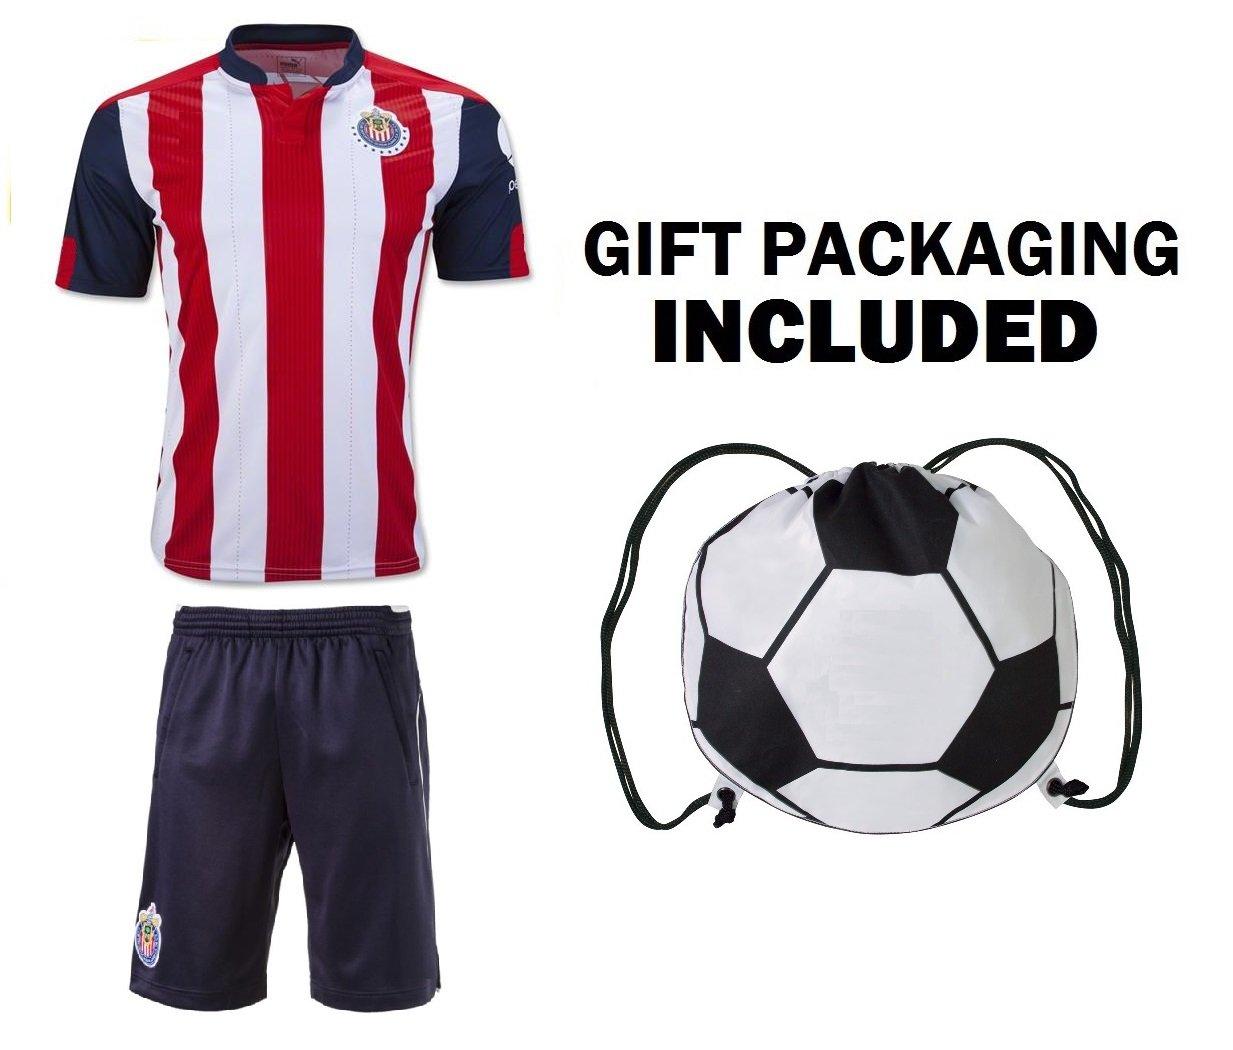 8a9a14ddaaa Fan Kitbag Chivas C.D. Club Deportivo Guadalajara Youth Soccer Jersey    Shorts Kids Premium Gift Kitbag ✮ BONUS GIFT Soccer Backpack